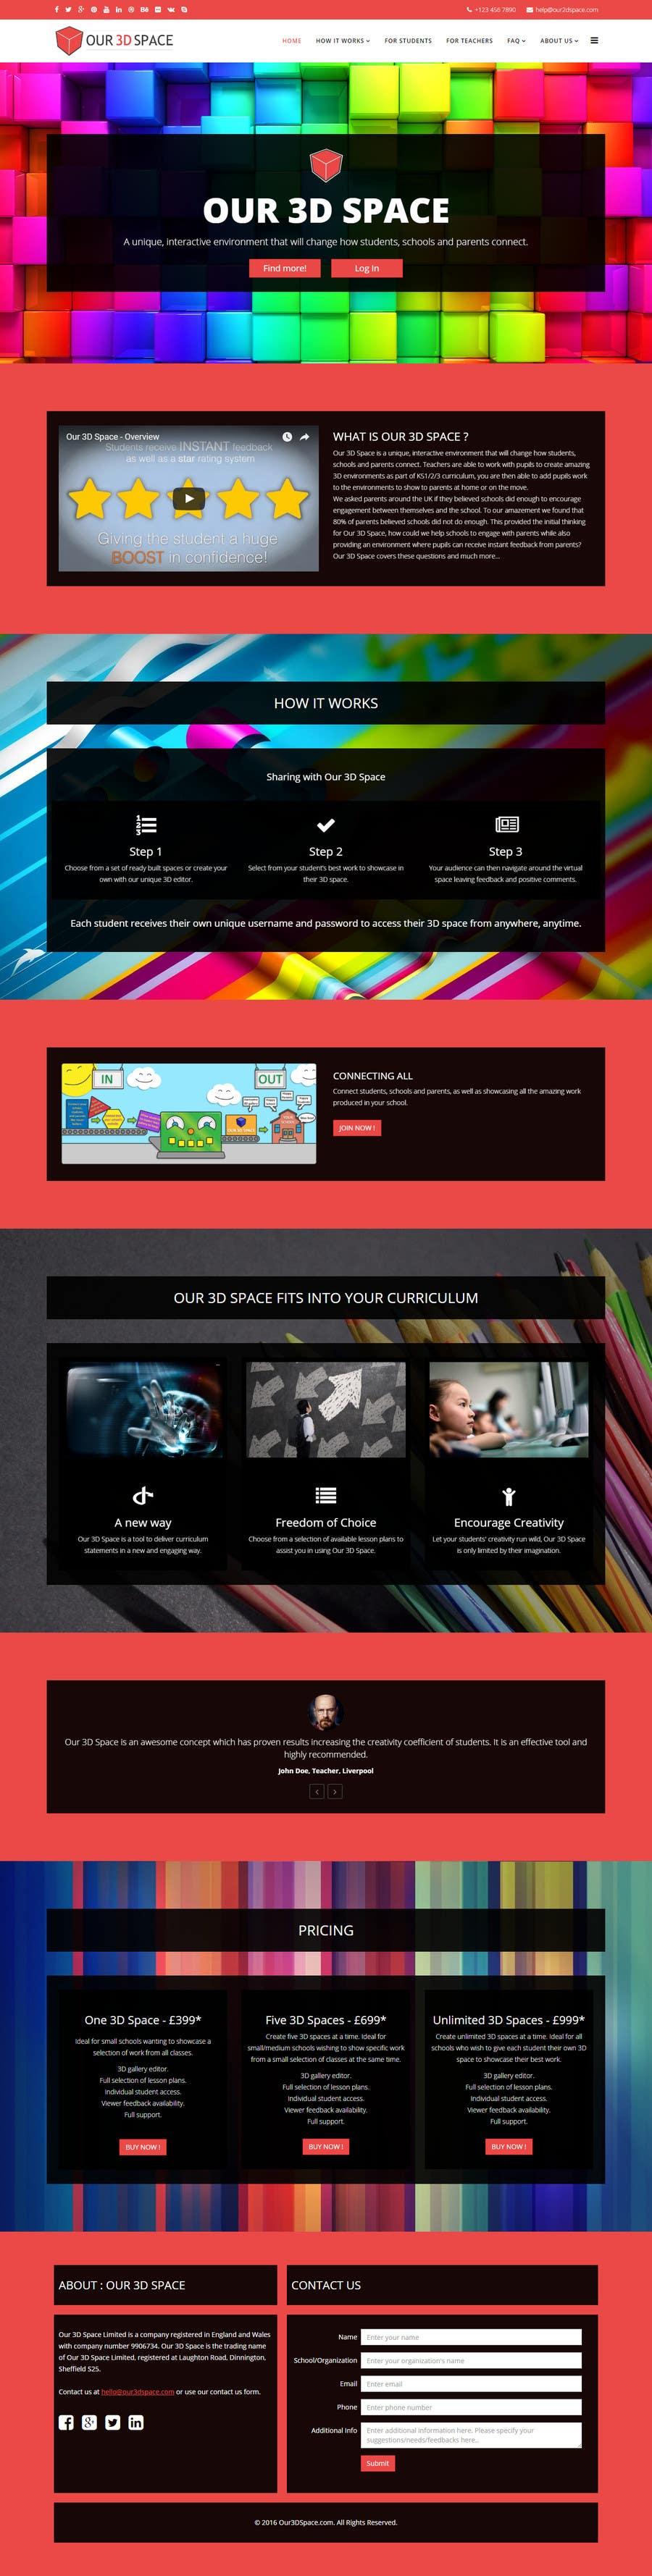 Kilpailutyö #18 kilpailussa Design a Website Mockup for an existing site